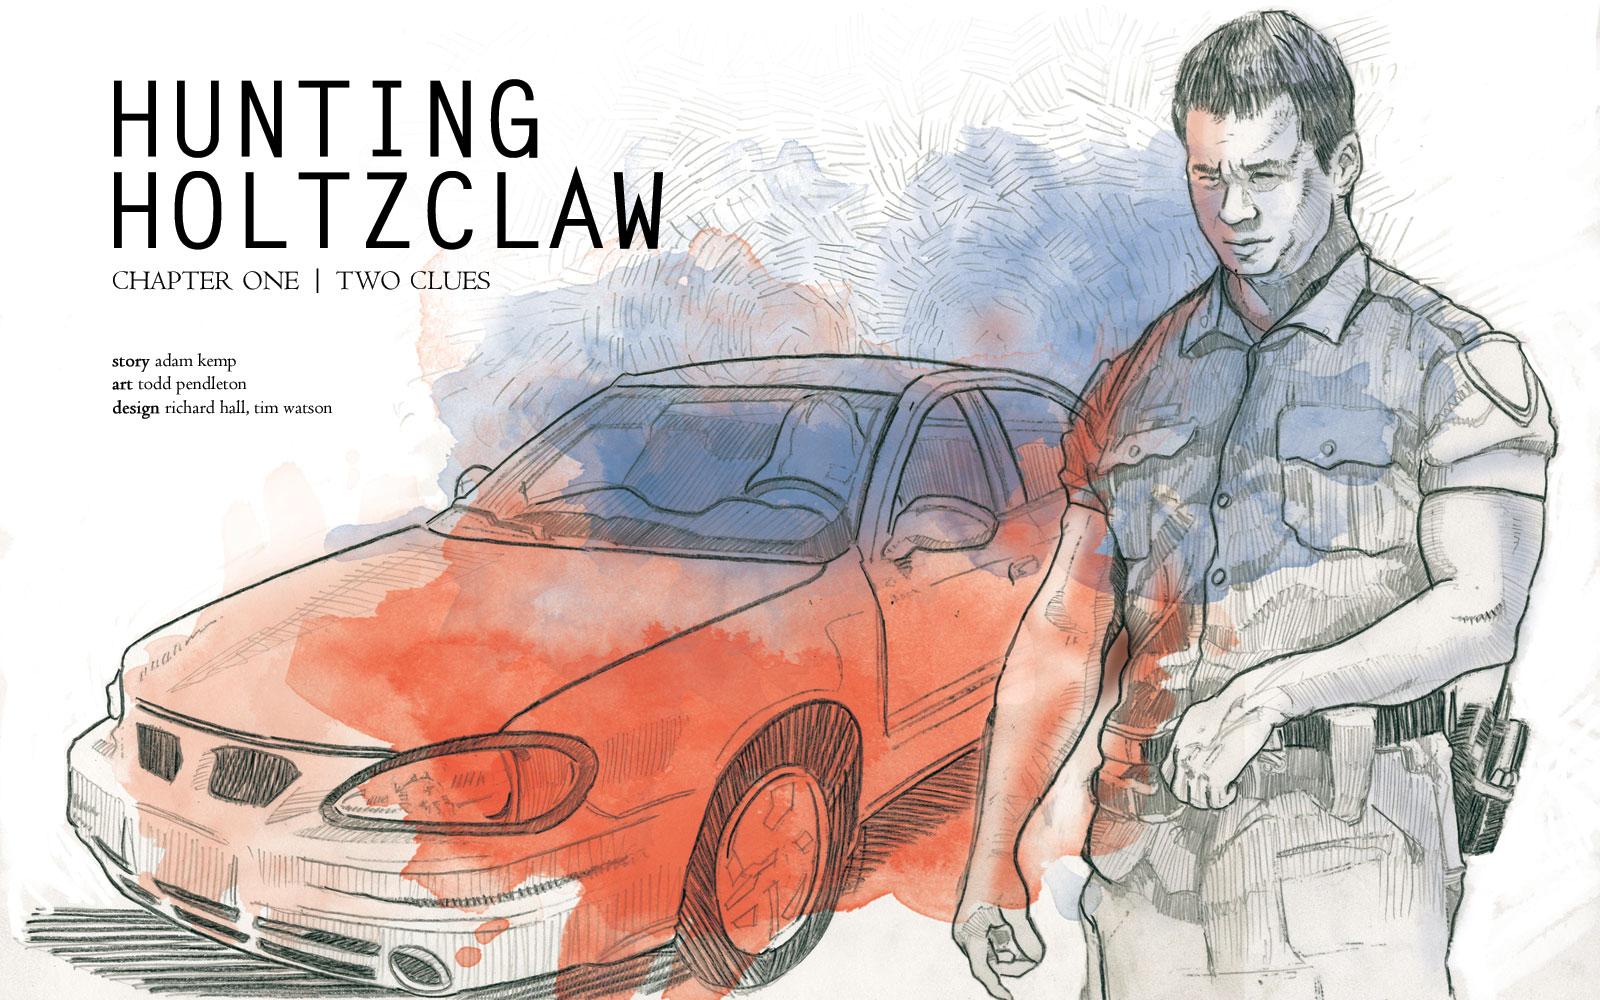 Hunting Holtzclaw